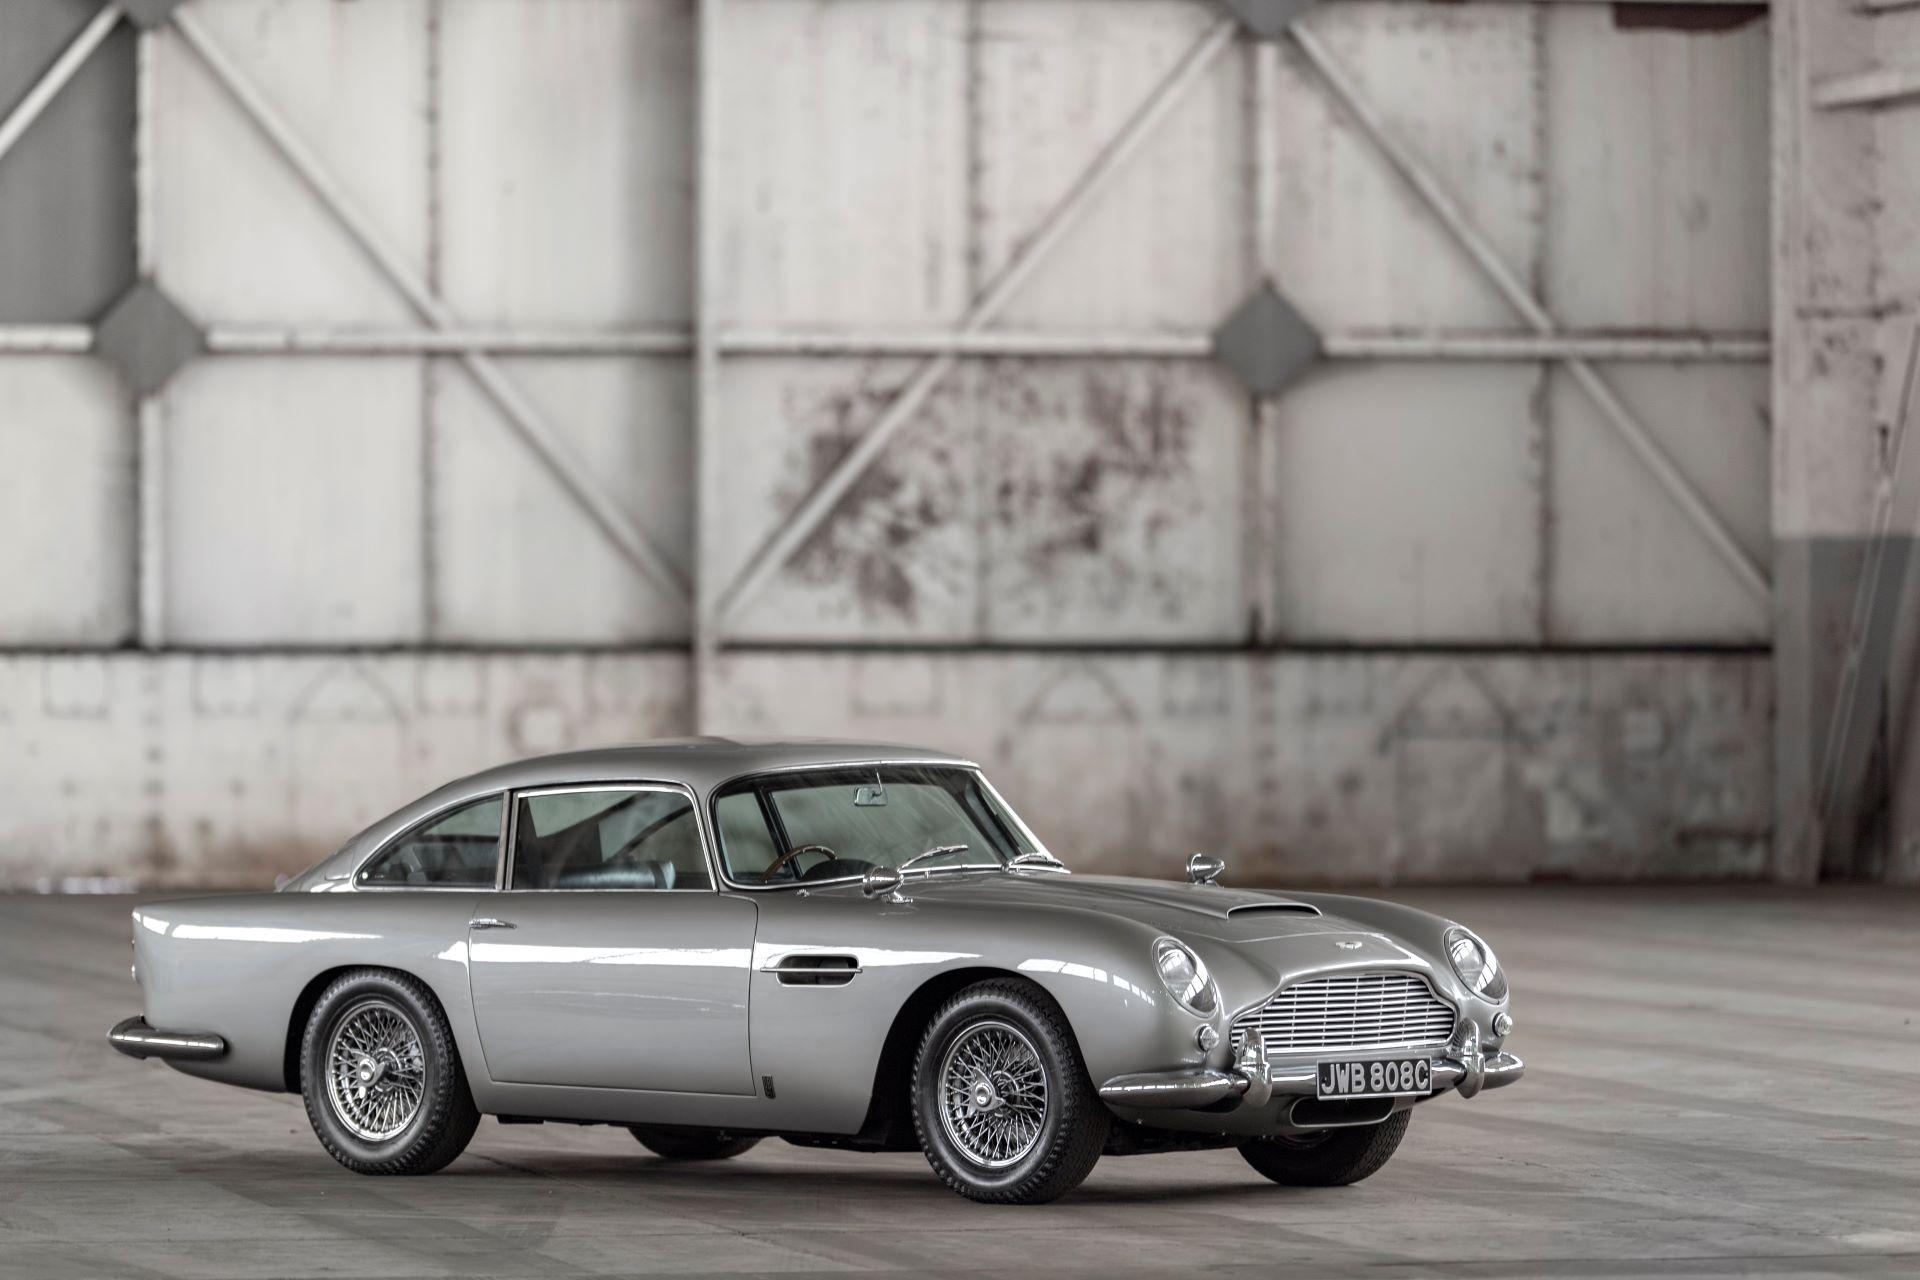 SentinelOne takes the wheel of Aston Martin's cybersecurity